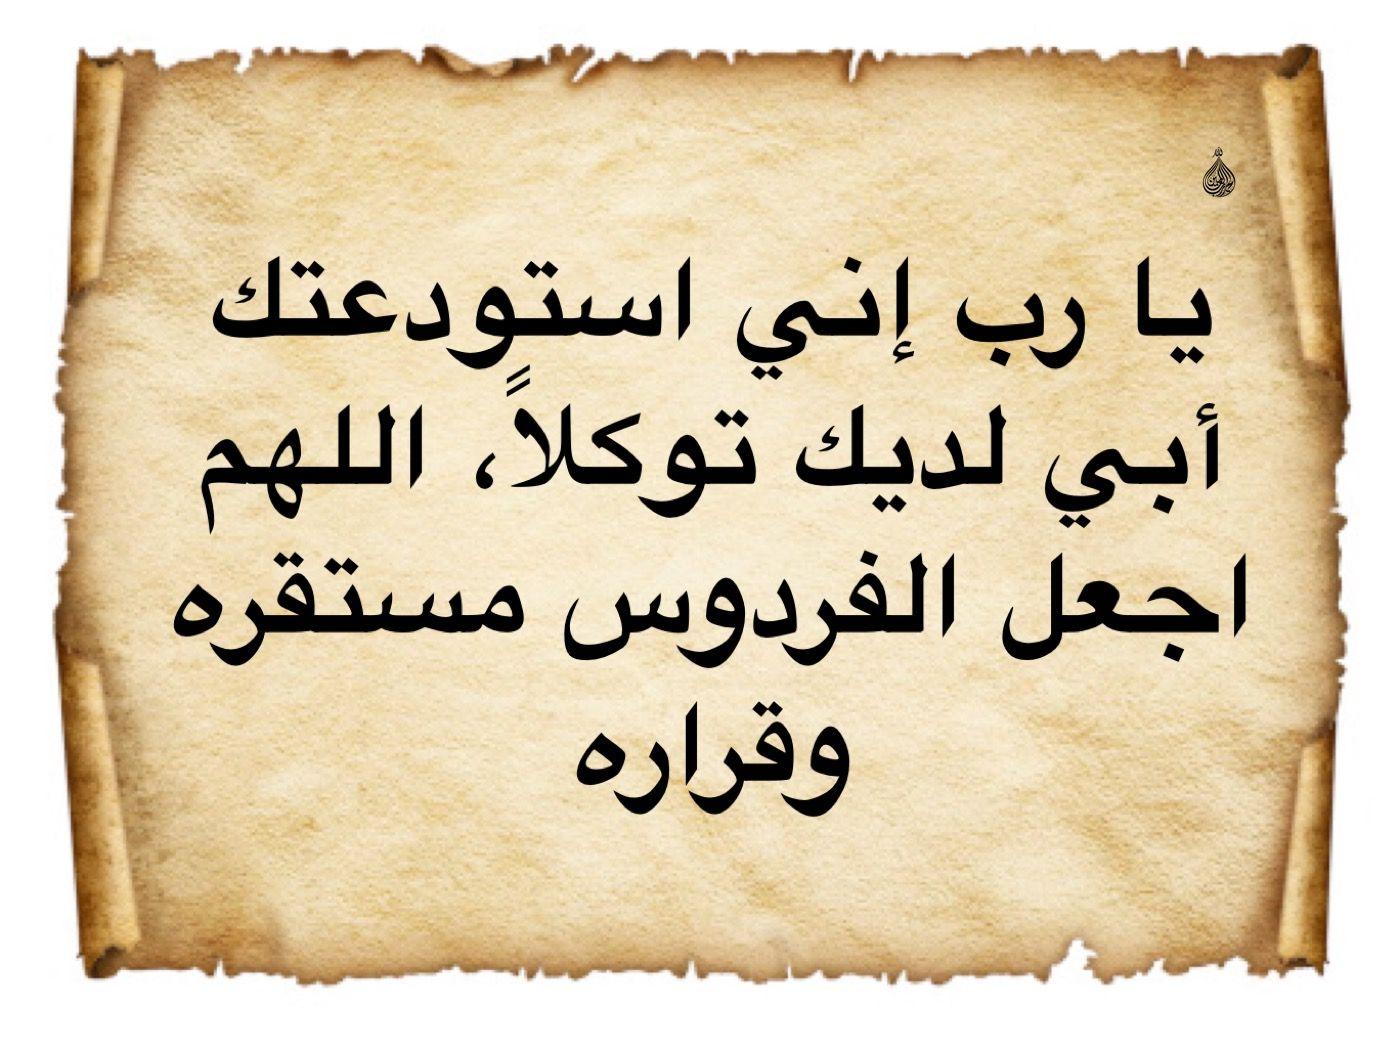 Pin By أدعية إسلامية دعاء أأذكار الج On دعاء Arabic Calligraphy Calligraphy Projects To Try